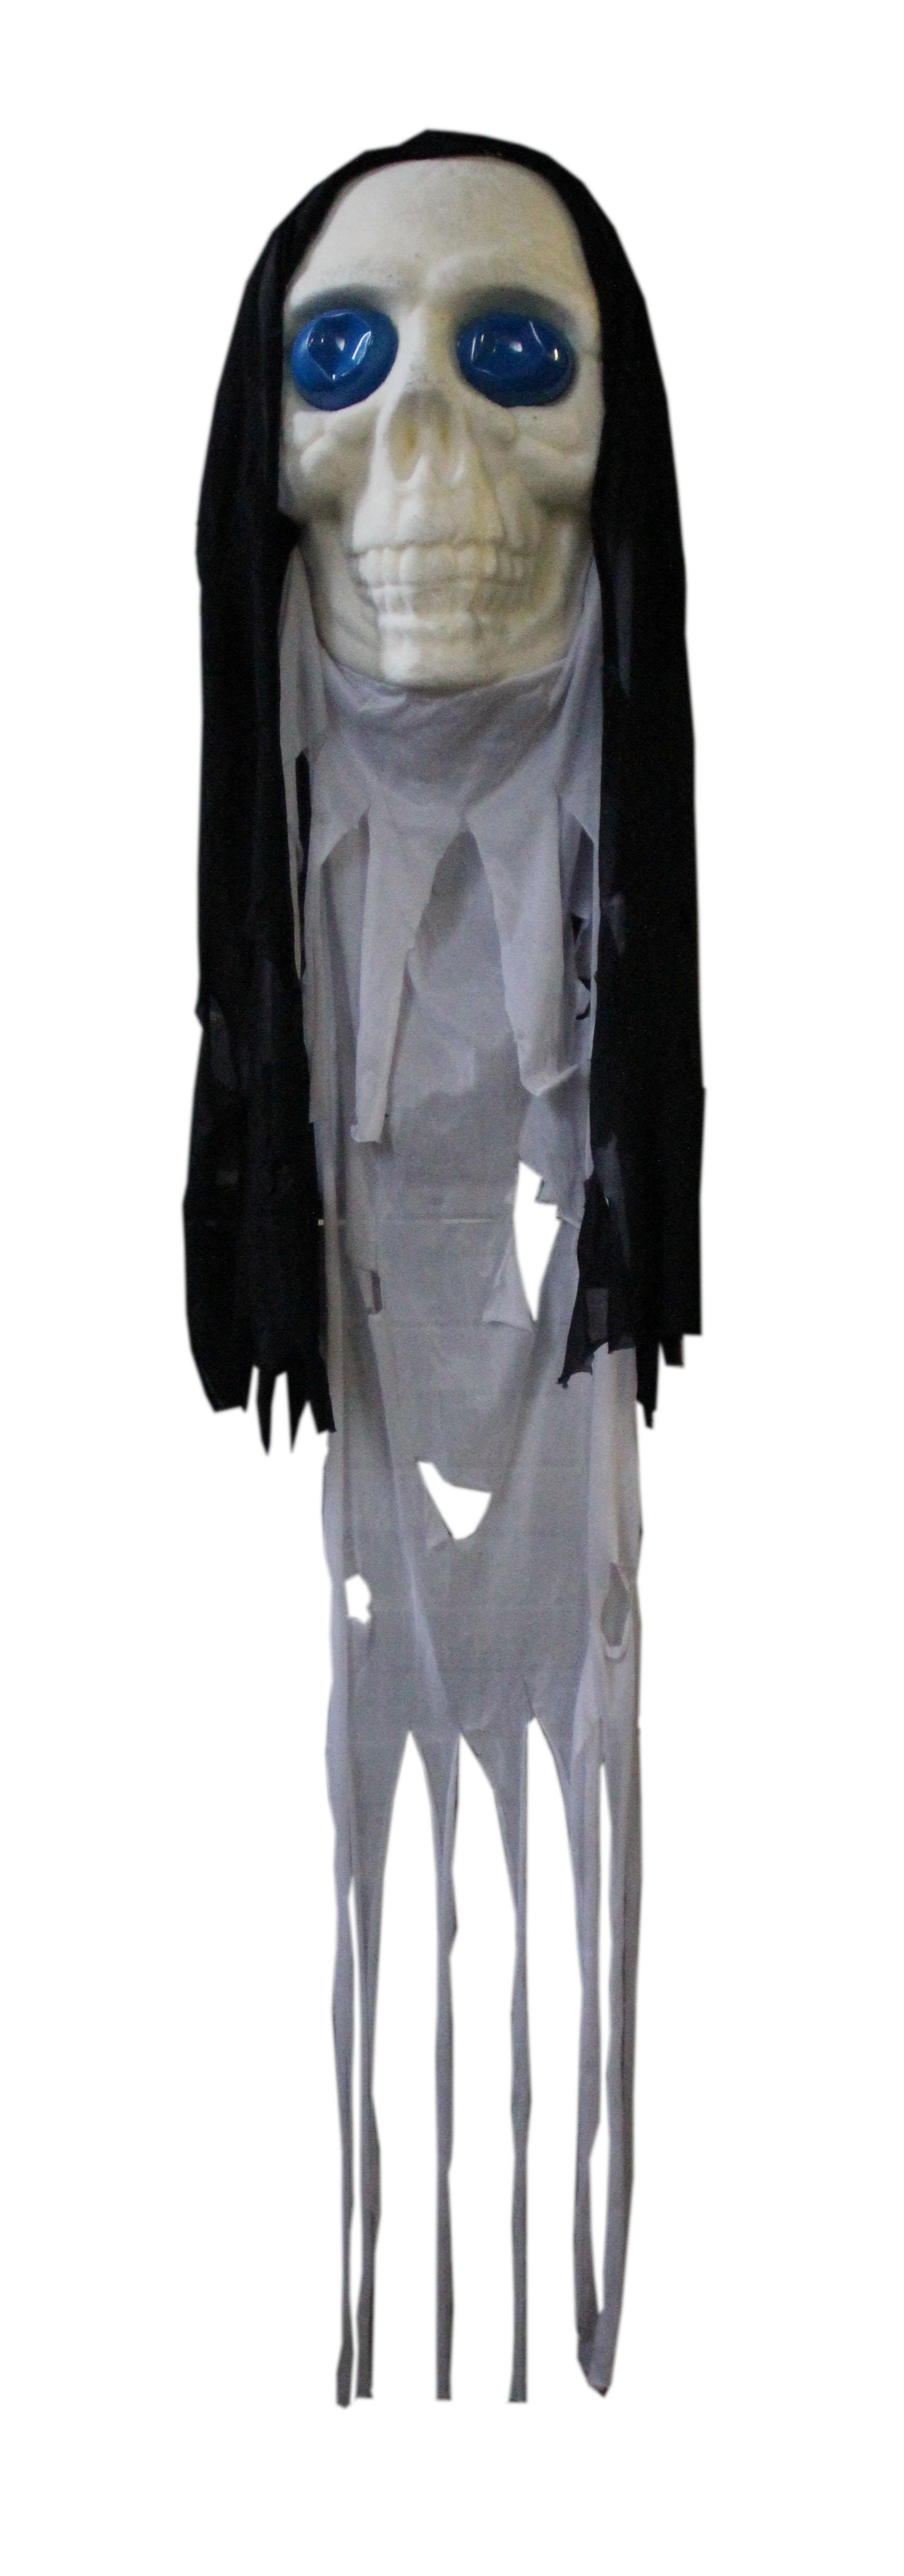 Декорация Жуткий Череп (UNI) -  Аксессуары на Хэллоуин